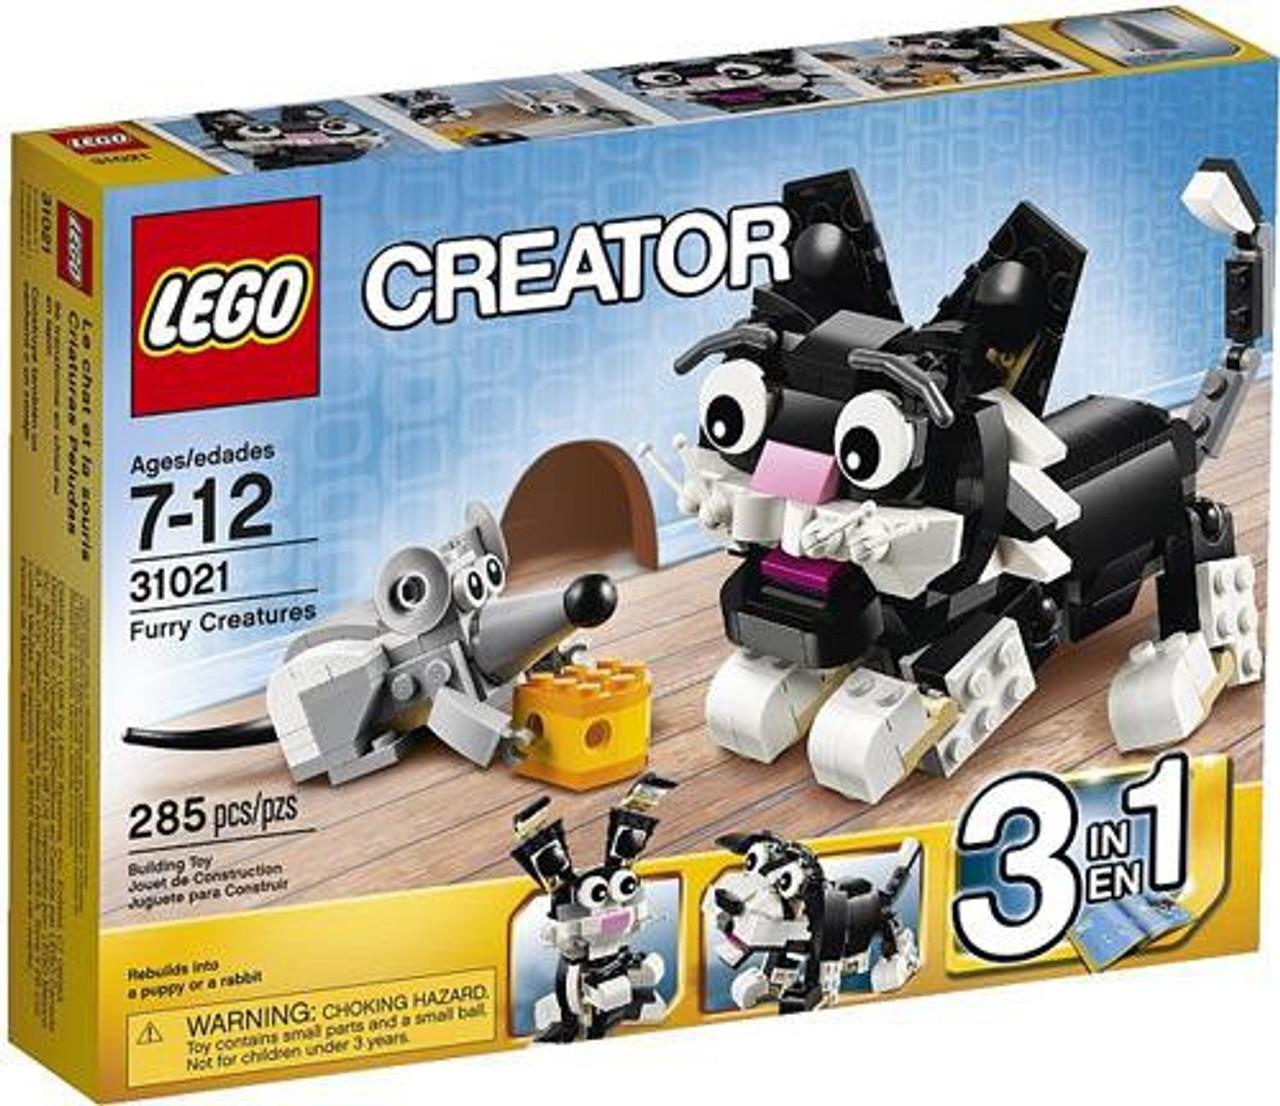 LEGO Creator Furry Creatures Set #31021